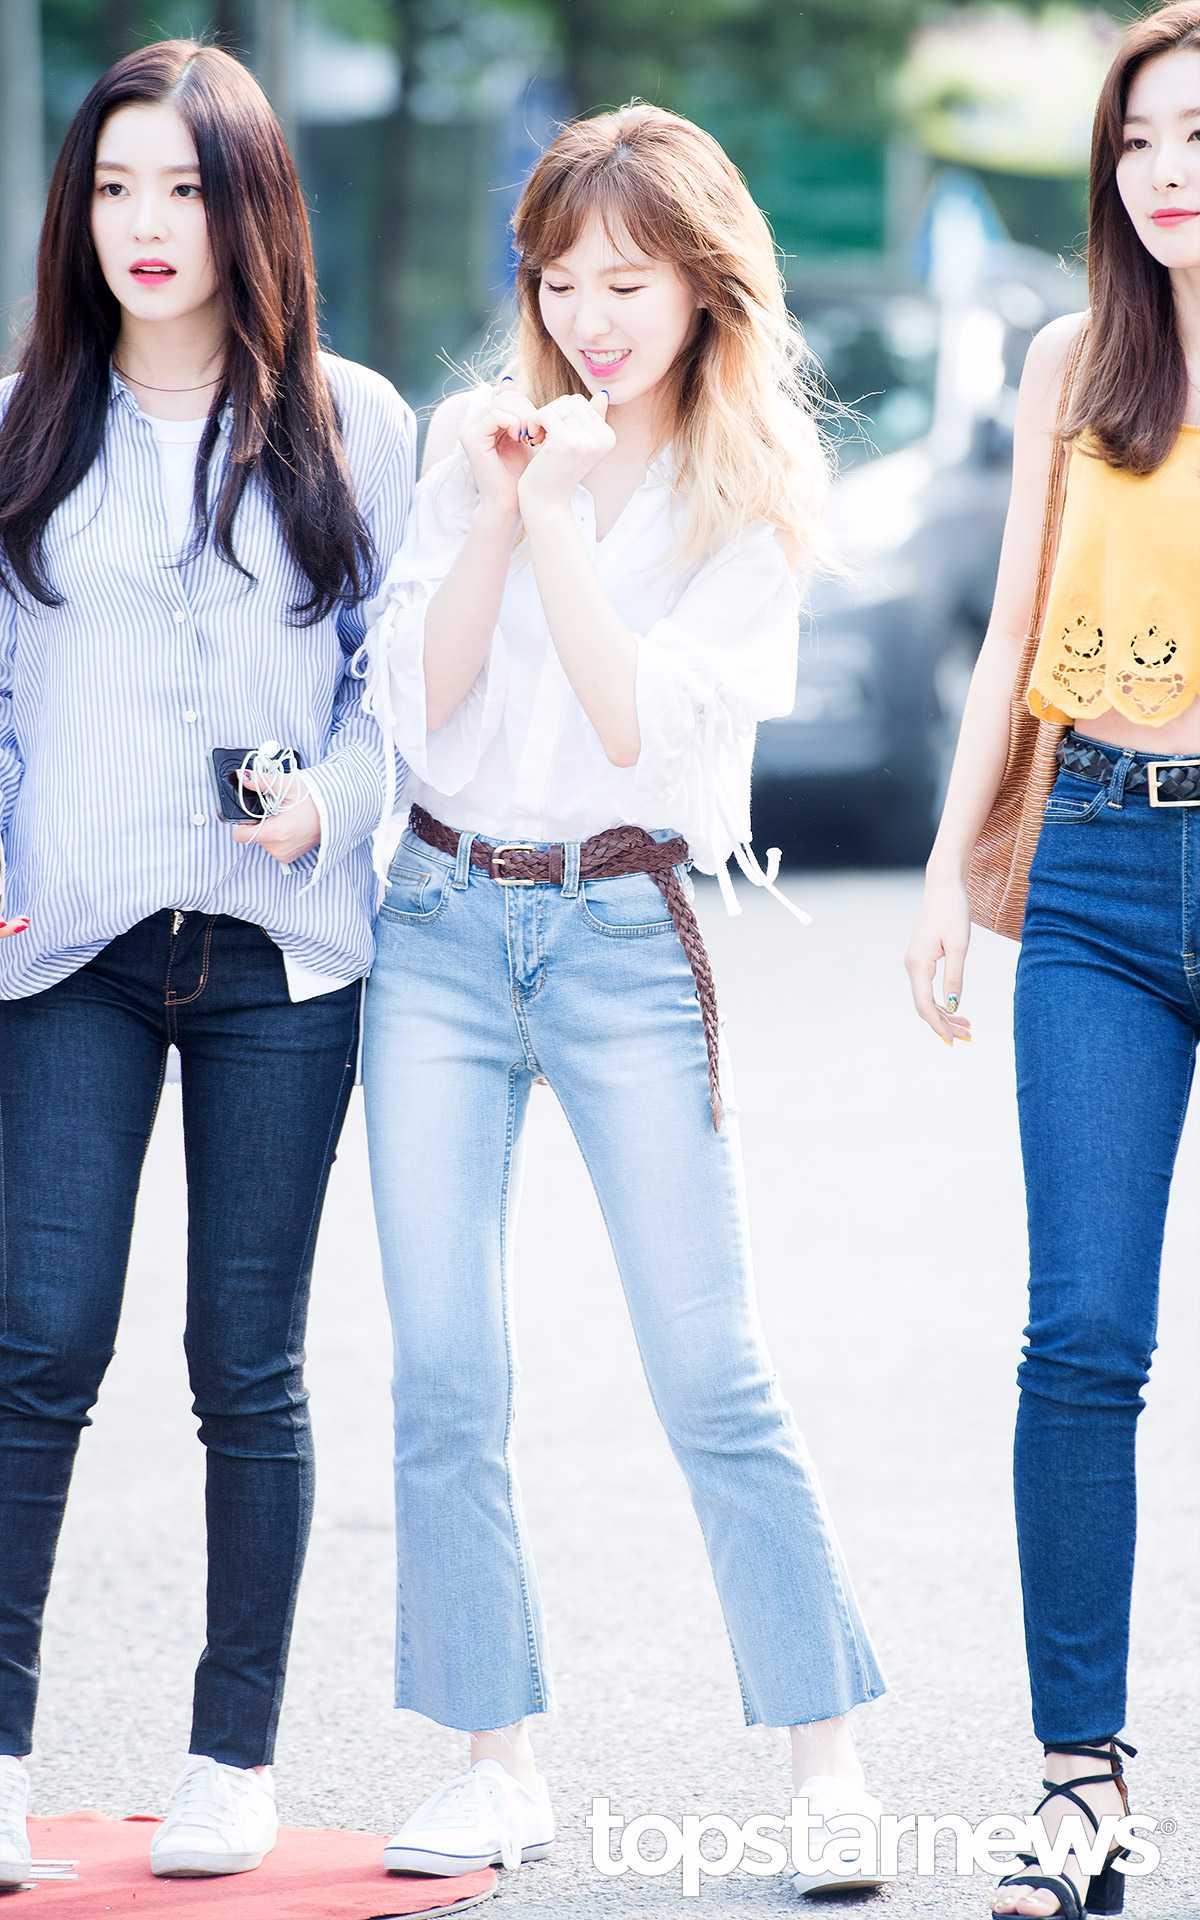 ◆Wendy Wendy選了一件跟Joy一樣的微露肩的襯衫來搭配丹寧褲, 而微喇叭款的丹寧褲也是最近韓妞流行的重點, 還有從去年開始流行起來的皮質腰帶。